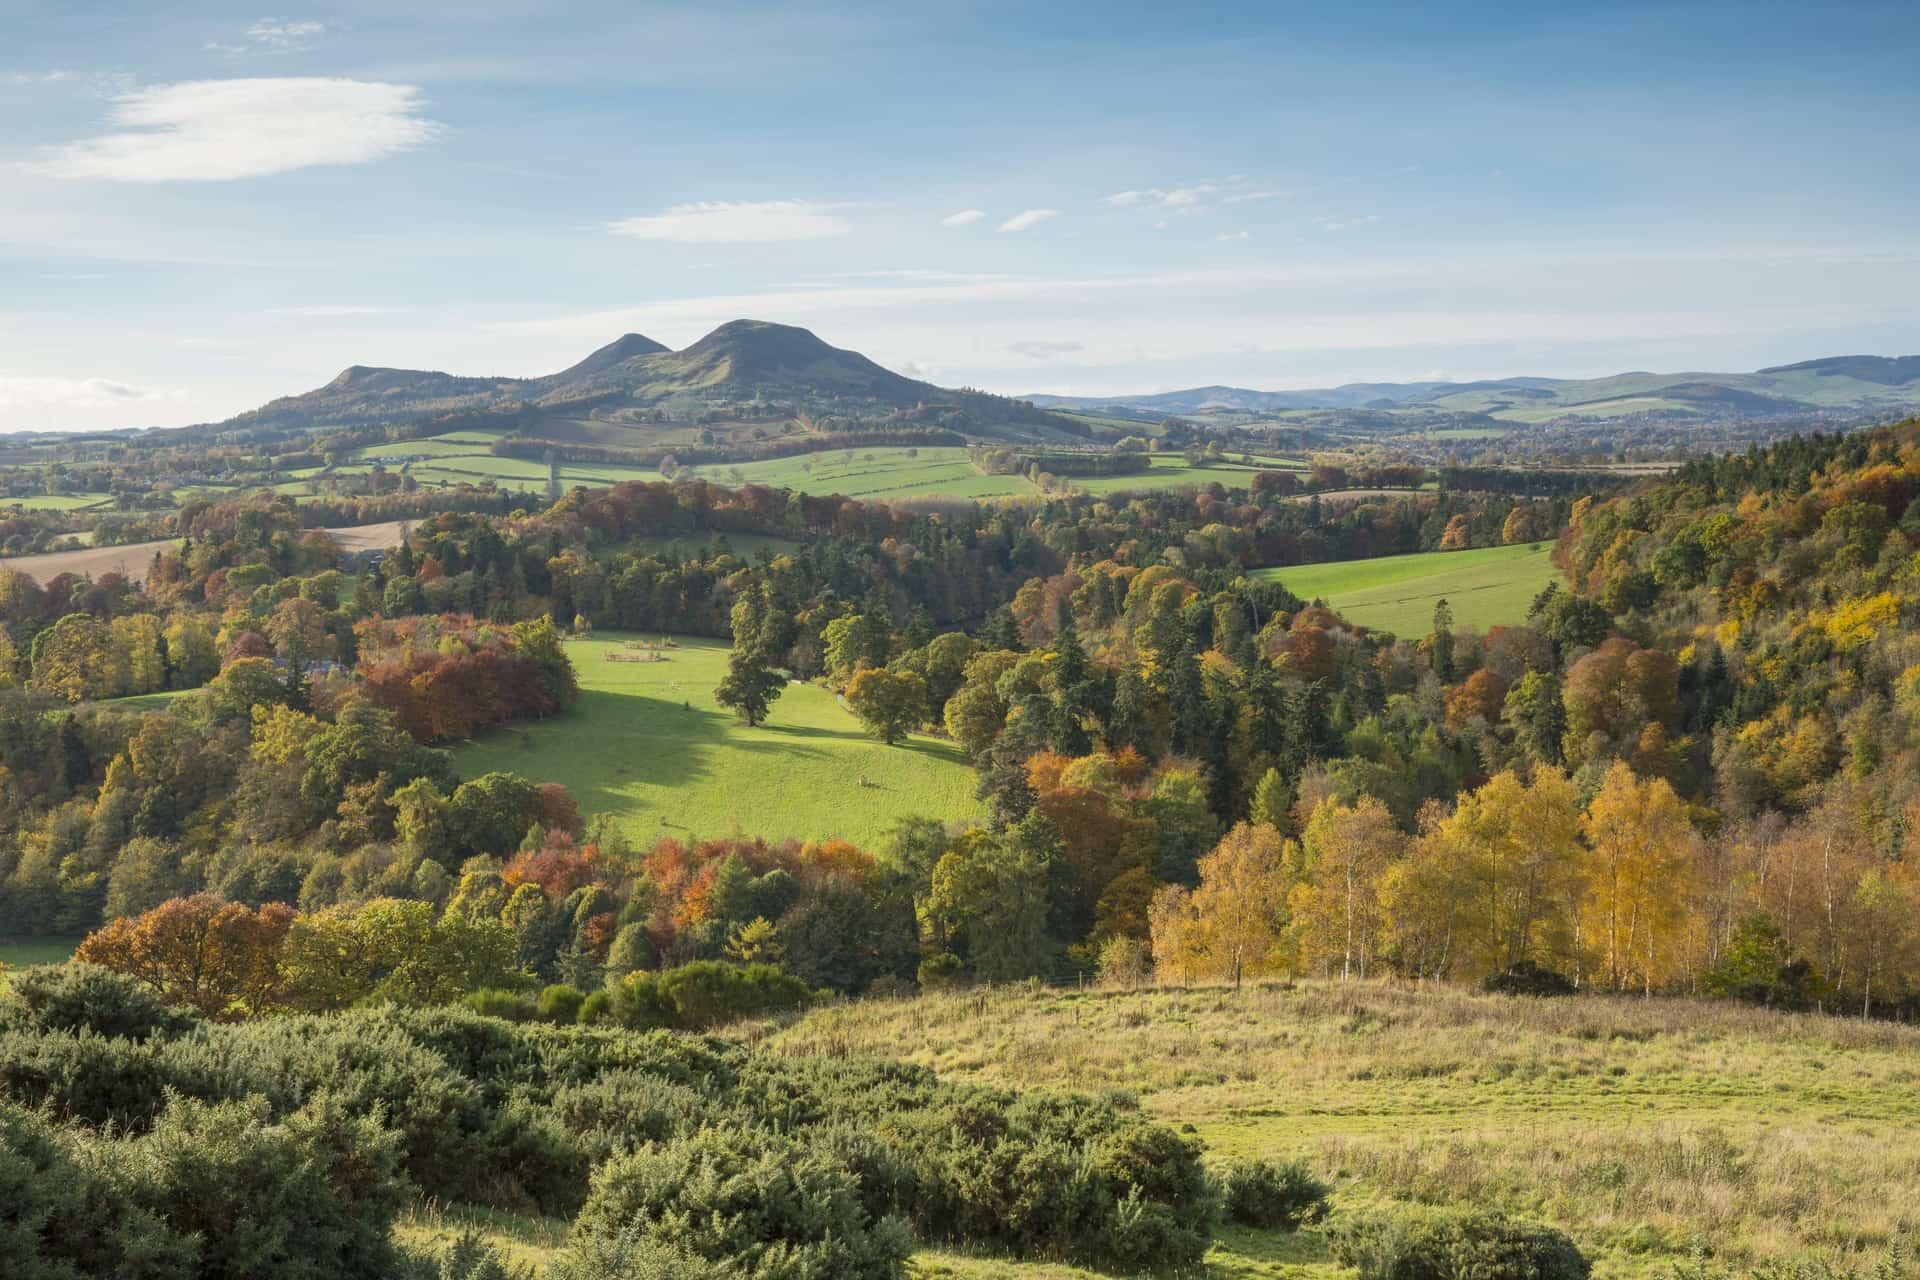 Eildon Hill, Walter Scott's view